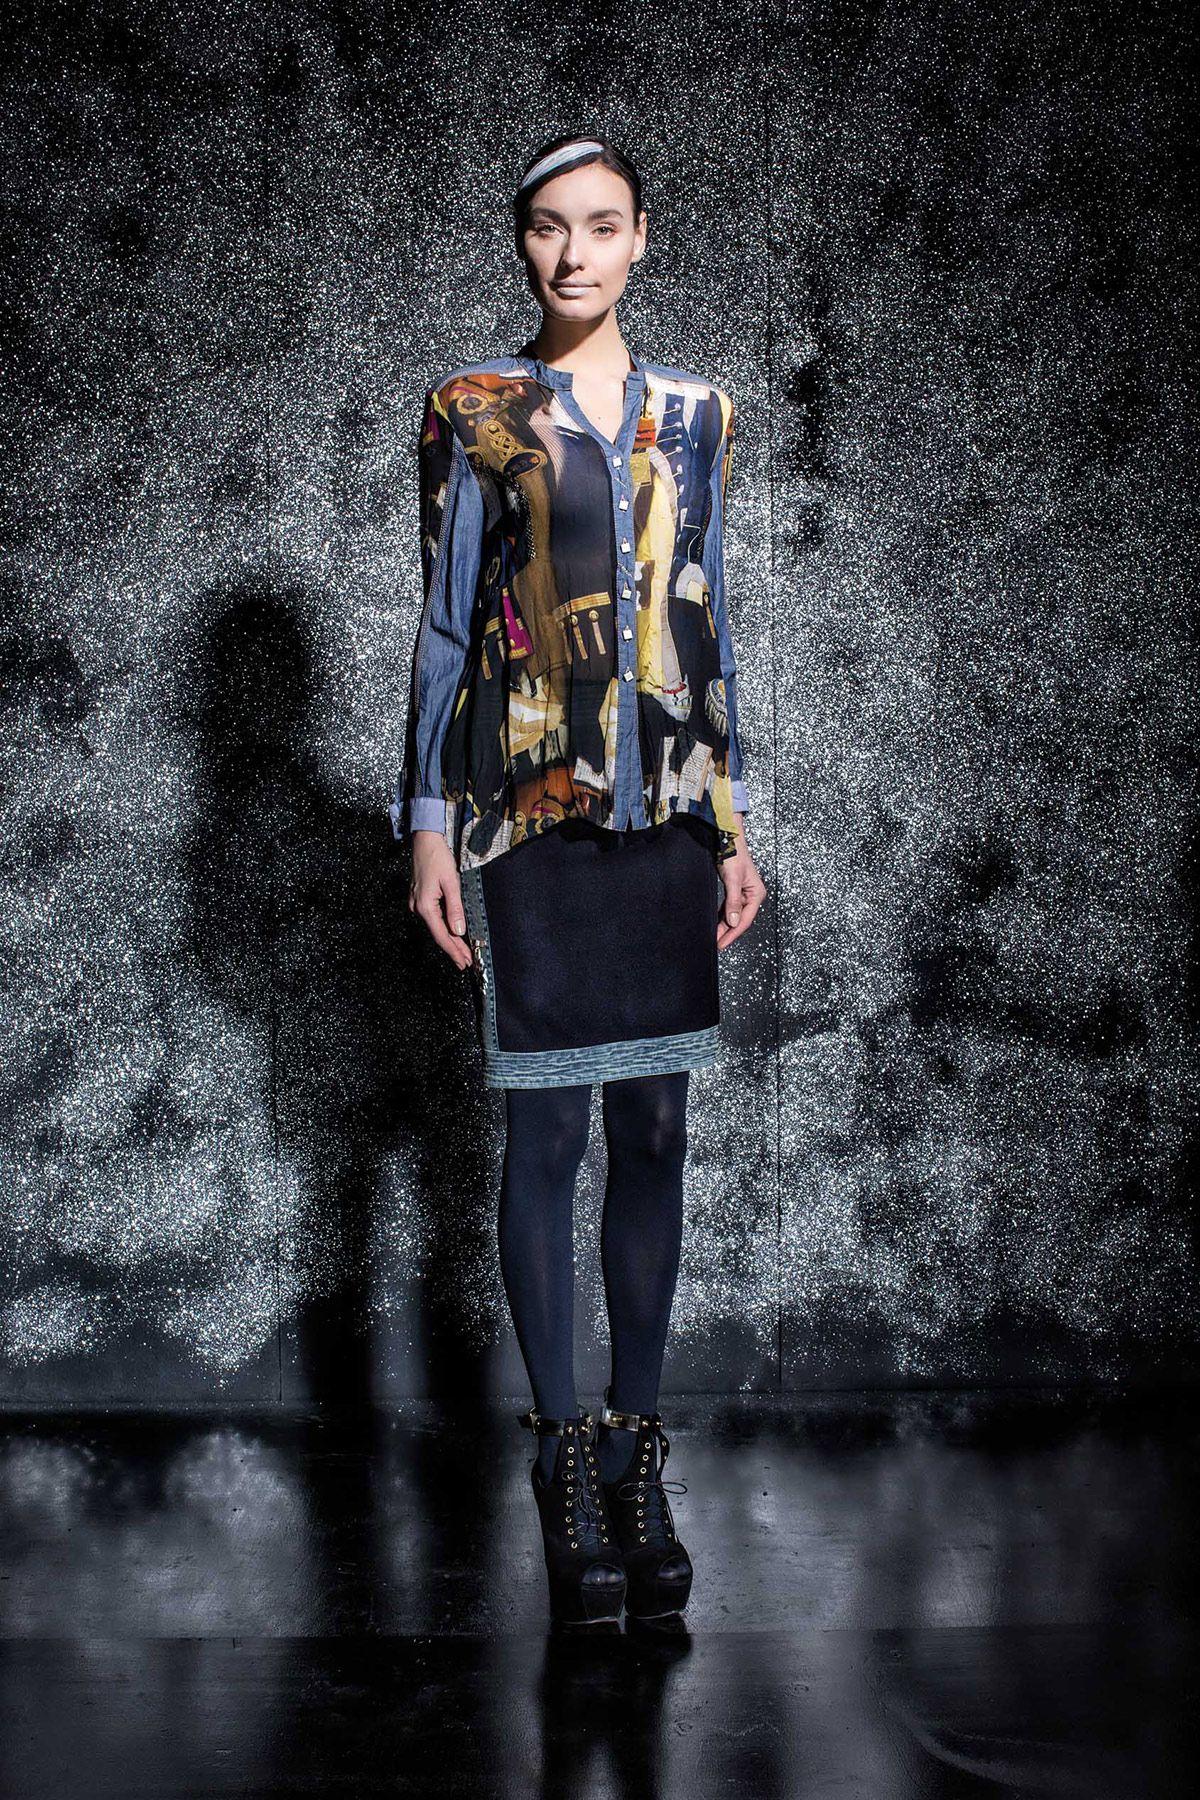 DANIELA DALLAVALLE - #danieladallavalle #collection #fw17 #elisacavaletti #woman #chick #skirt #shirt #fashion #details #detailsmatter #art #highheels #tights #print